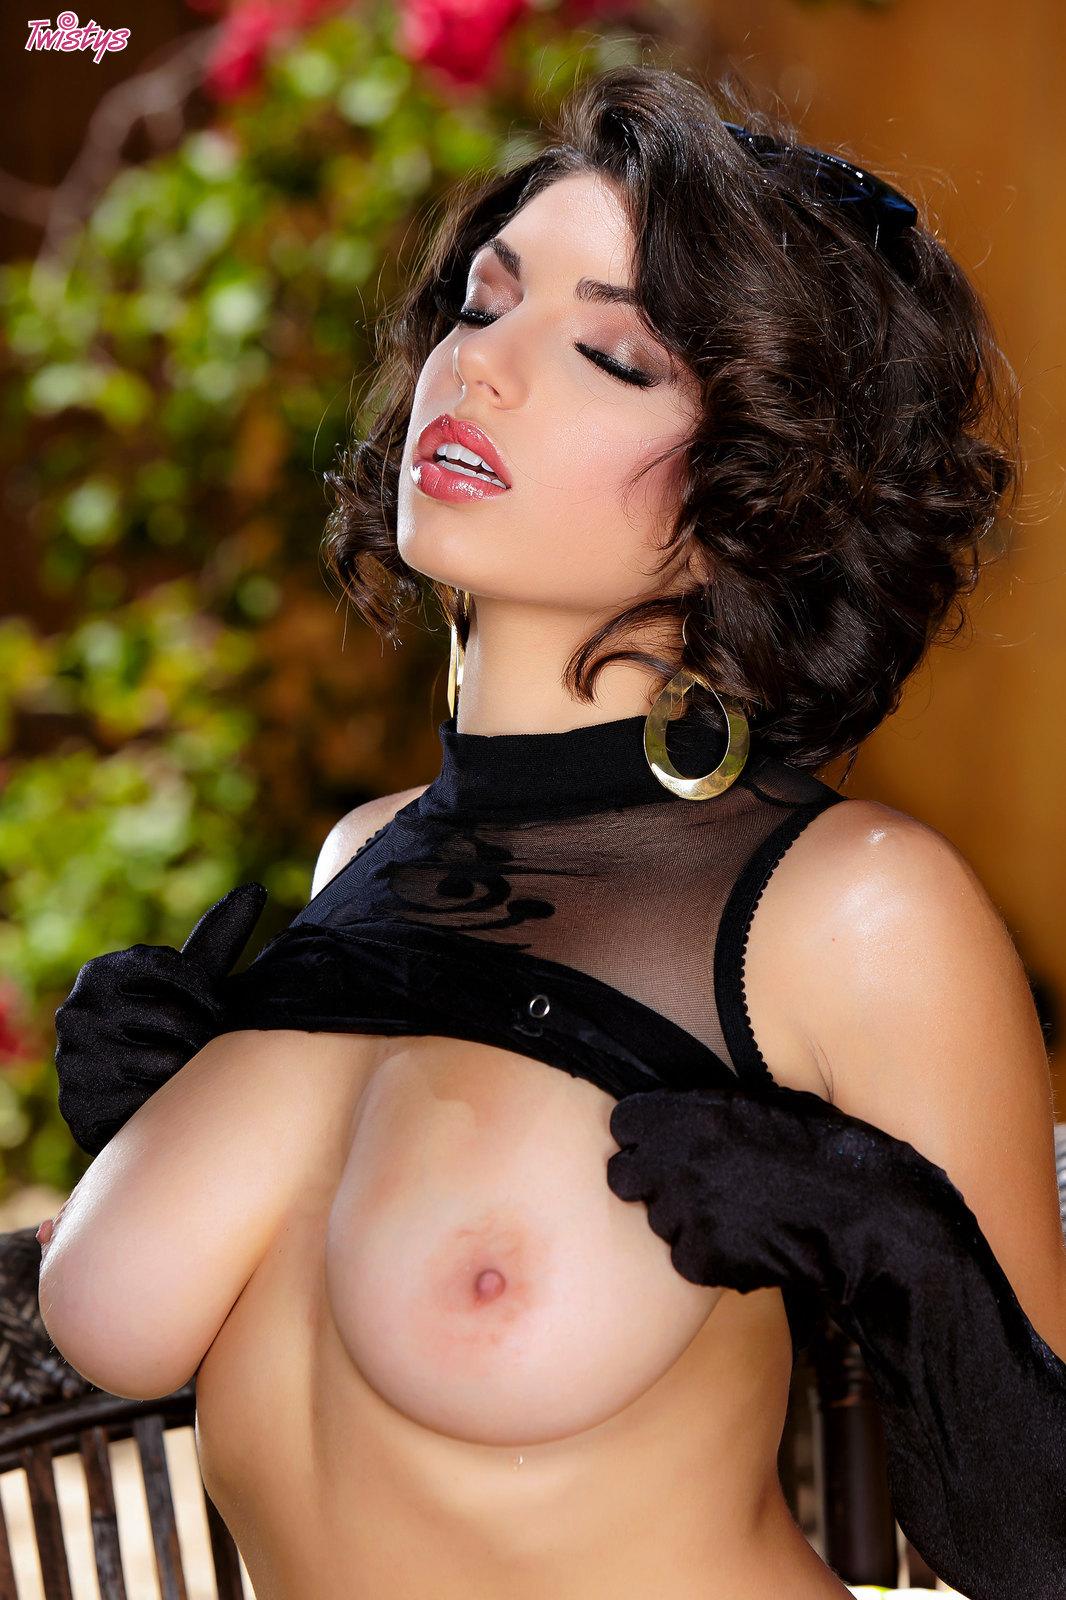 Erotic xnxxvideo nude image